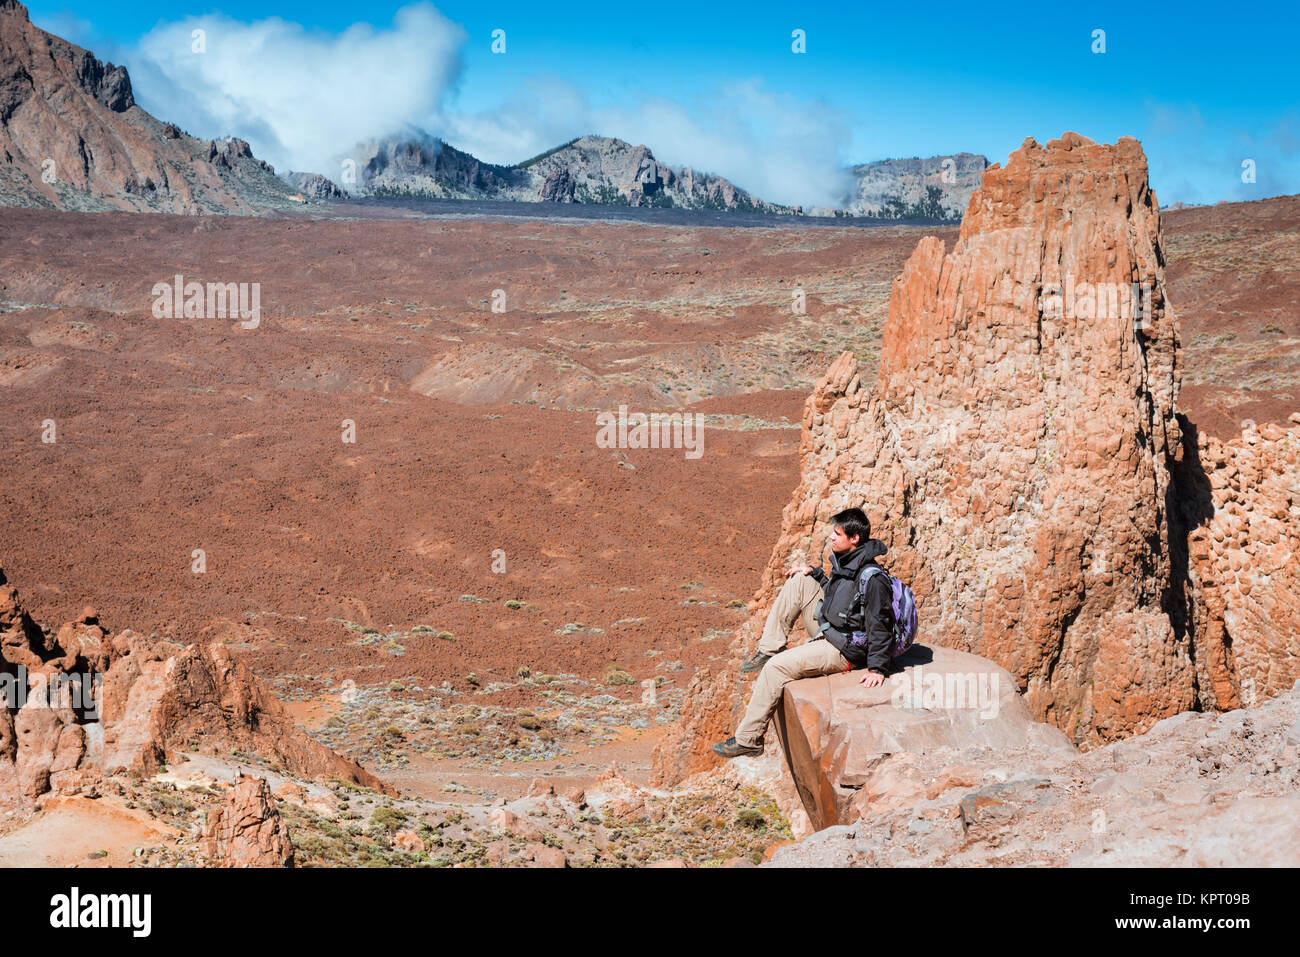 Hiker man hiking Teide national park Tenefire - Stock Image